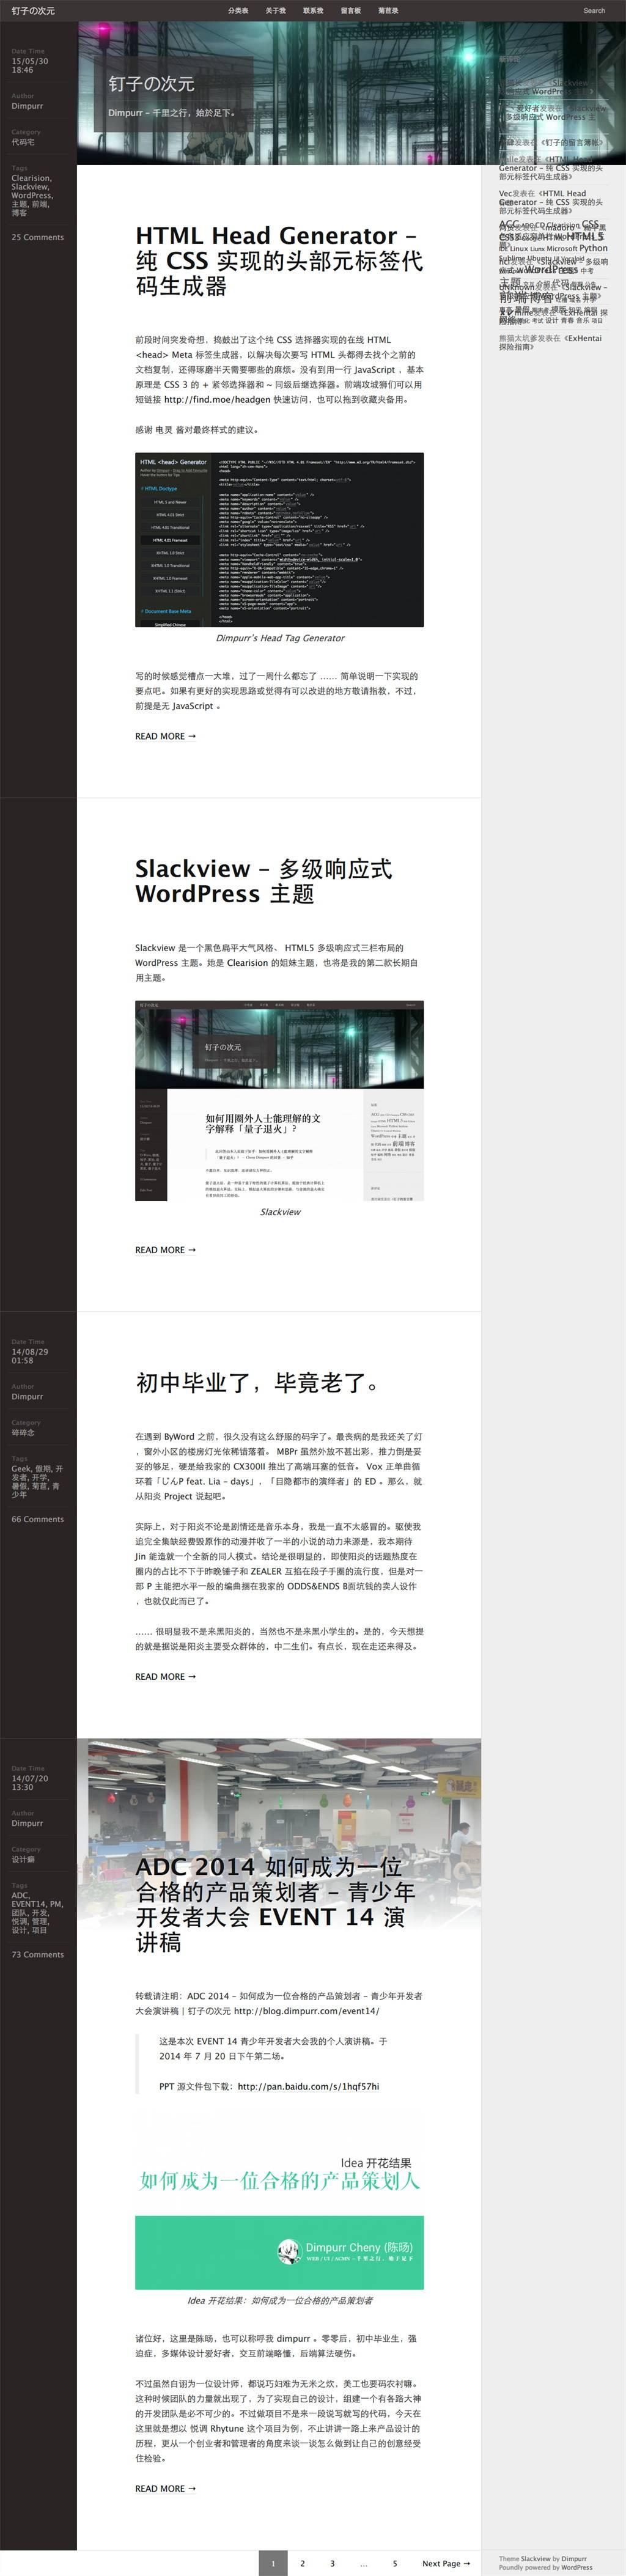 Slackview – 黑白多级响应式 WordPress 博客主题-WP酷